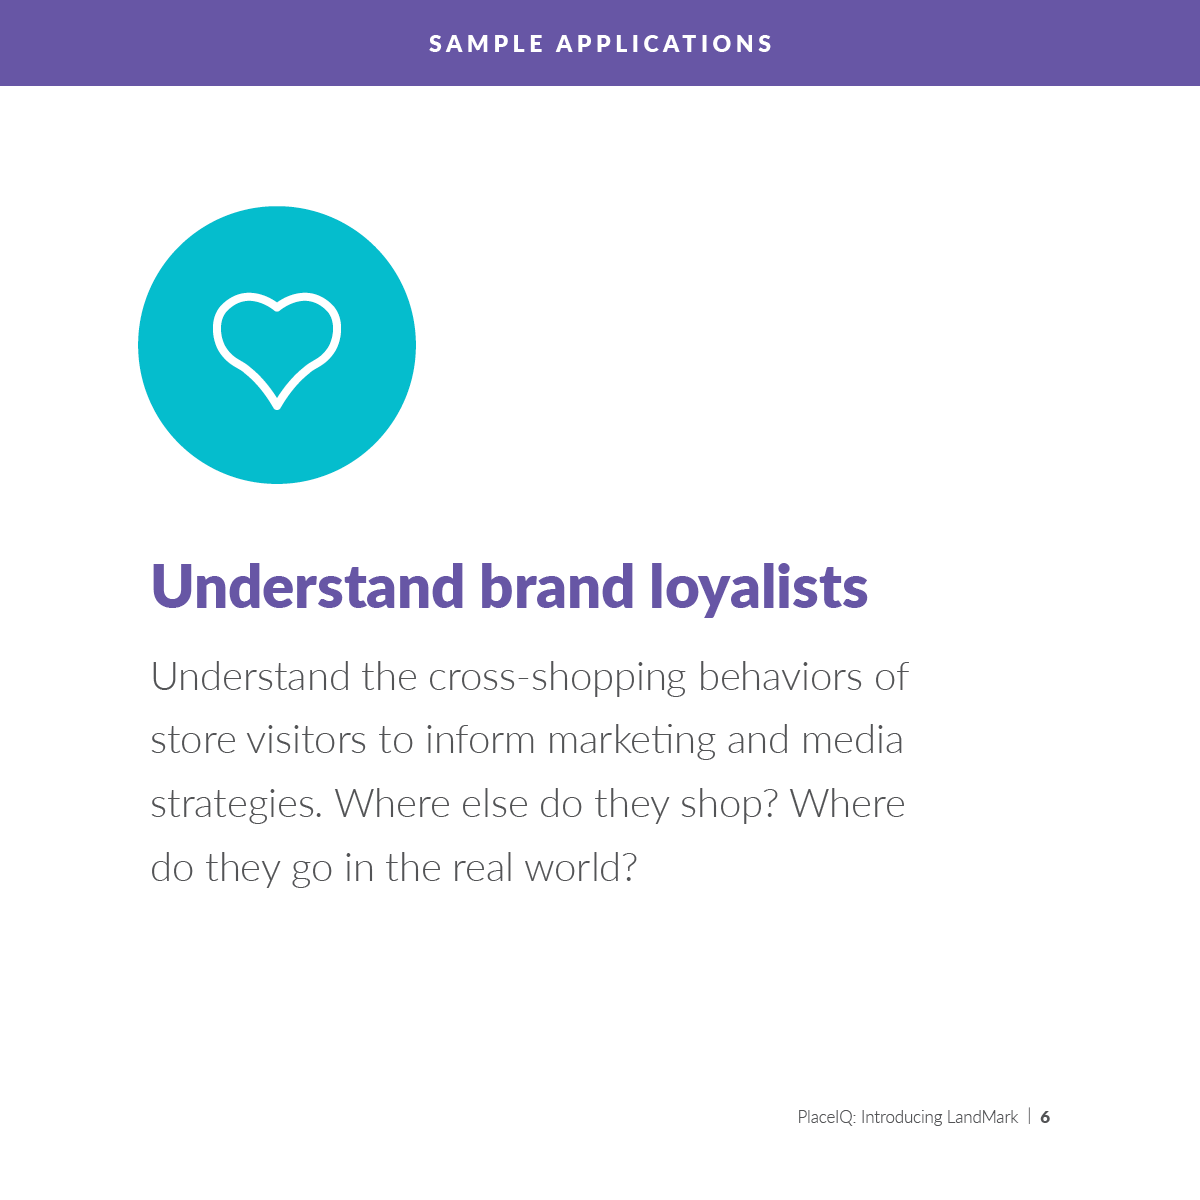 Understand brand loyalists